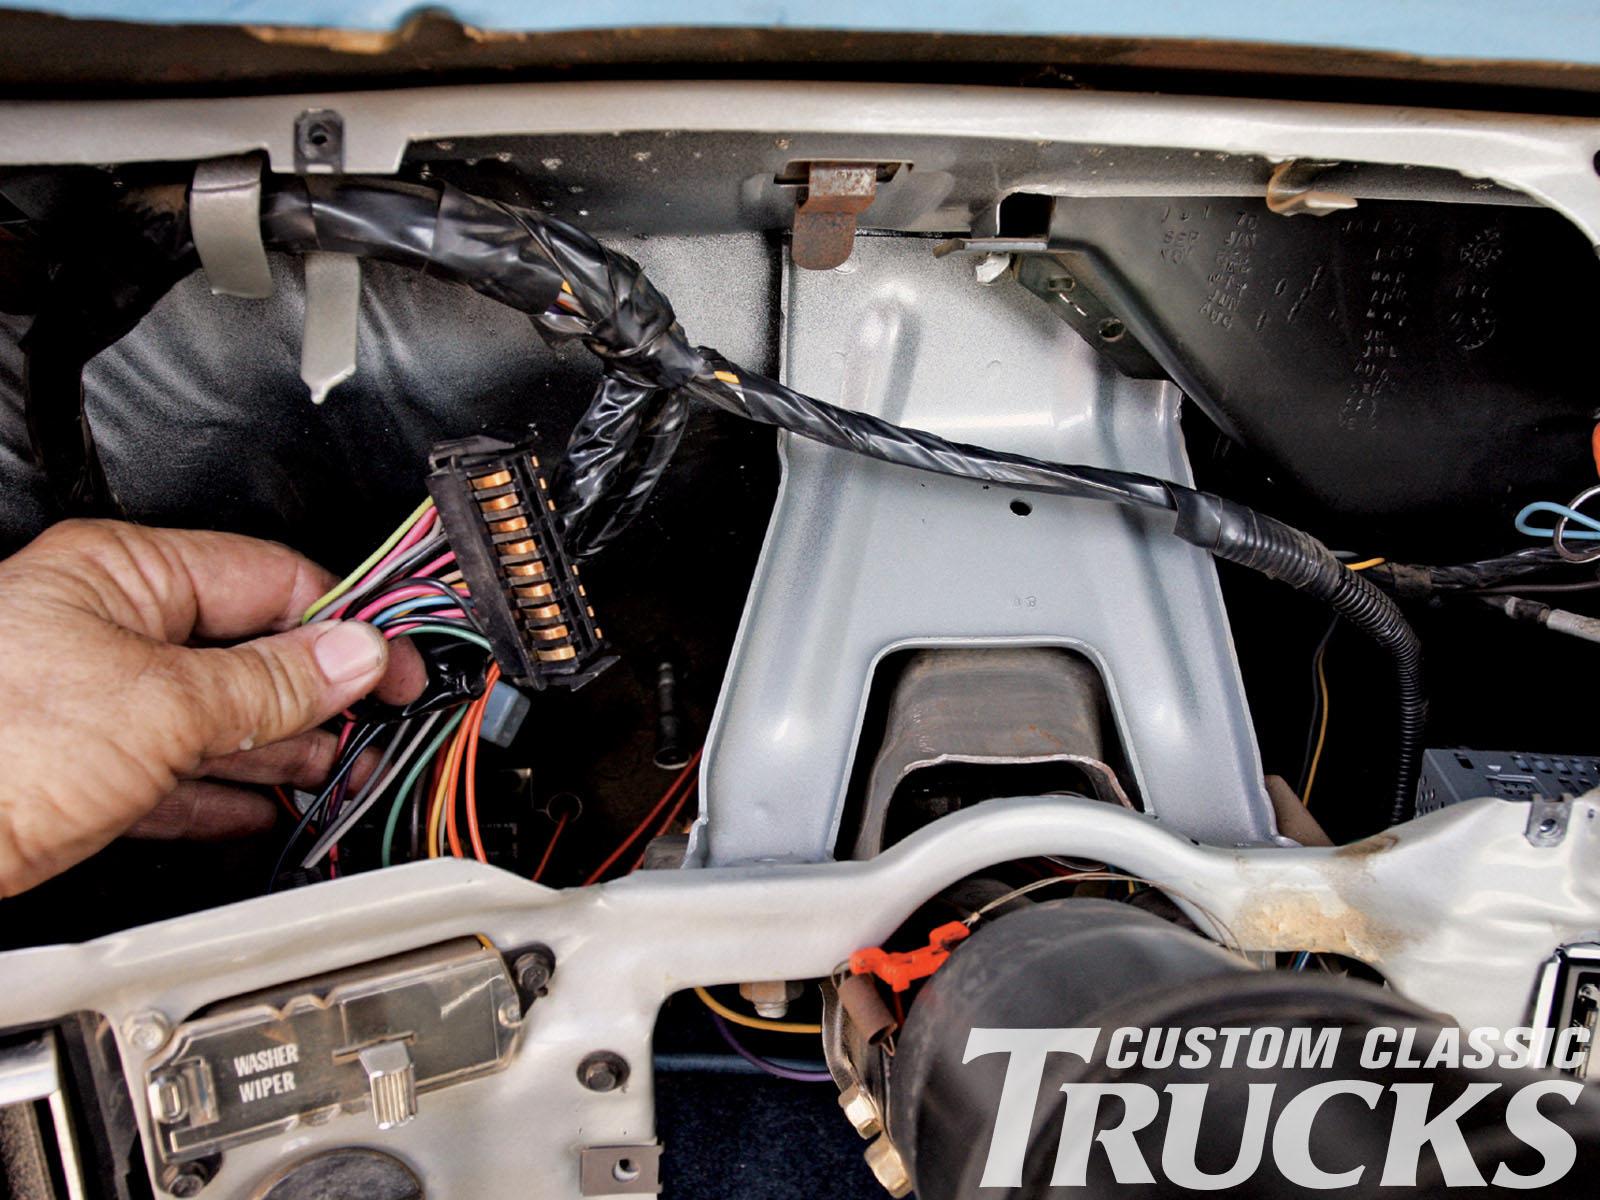 1981 c10 wiring diagram 1987 chevy truck wiring diagram chevrolet v8 trucks 1981 wiring  wiring diagram chevrolet v8 trucks 1981